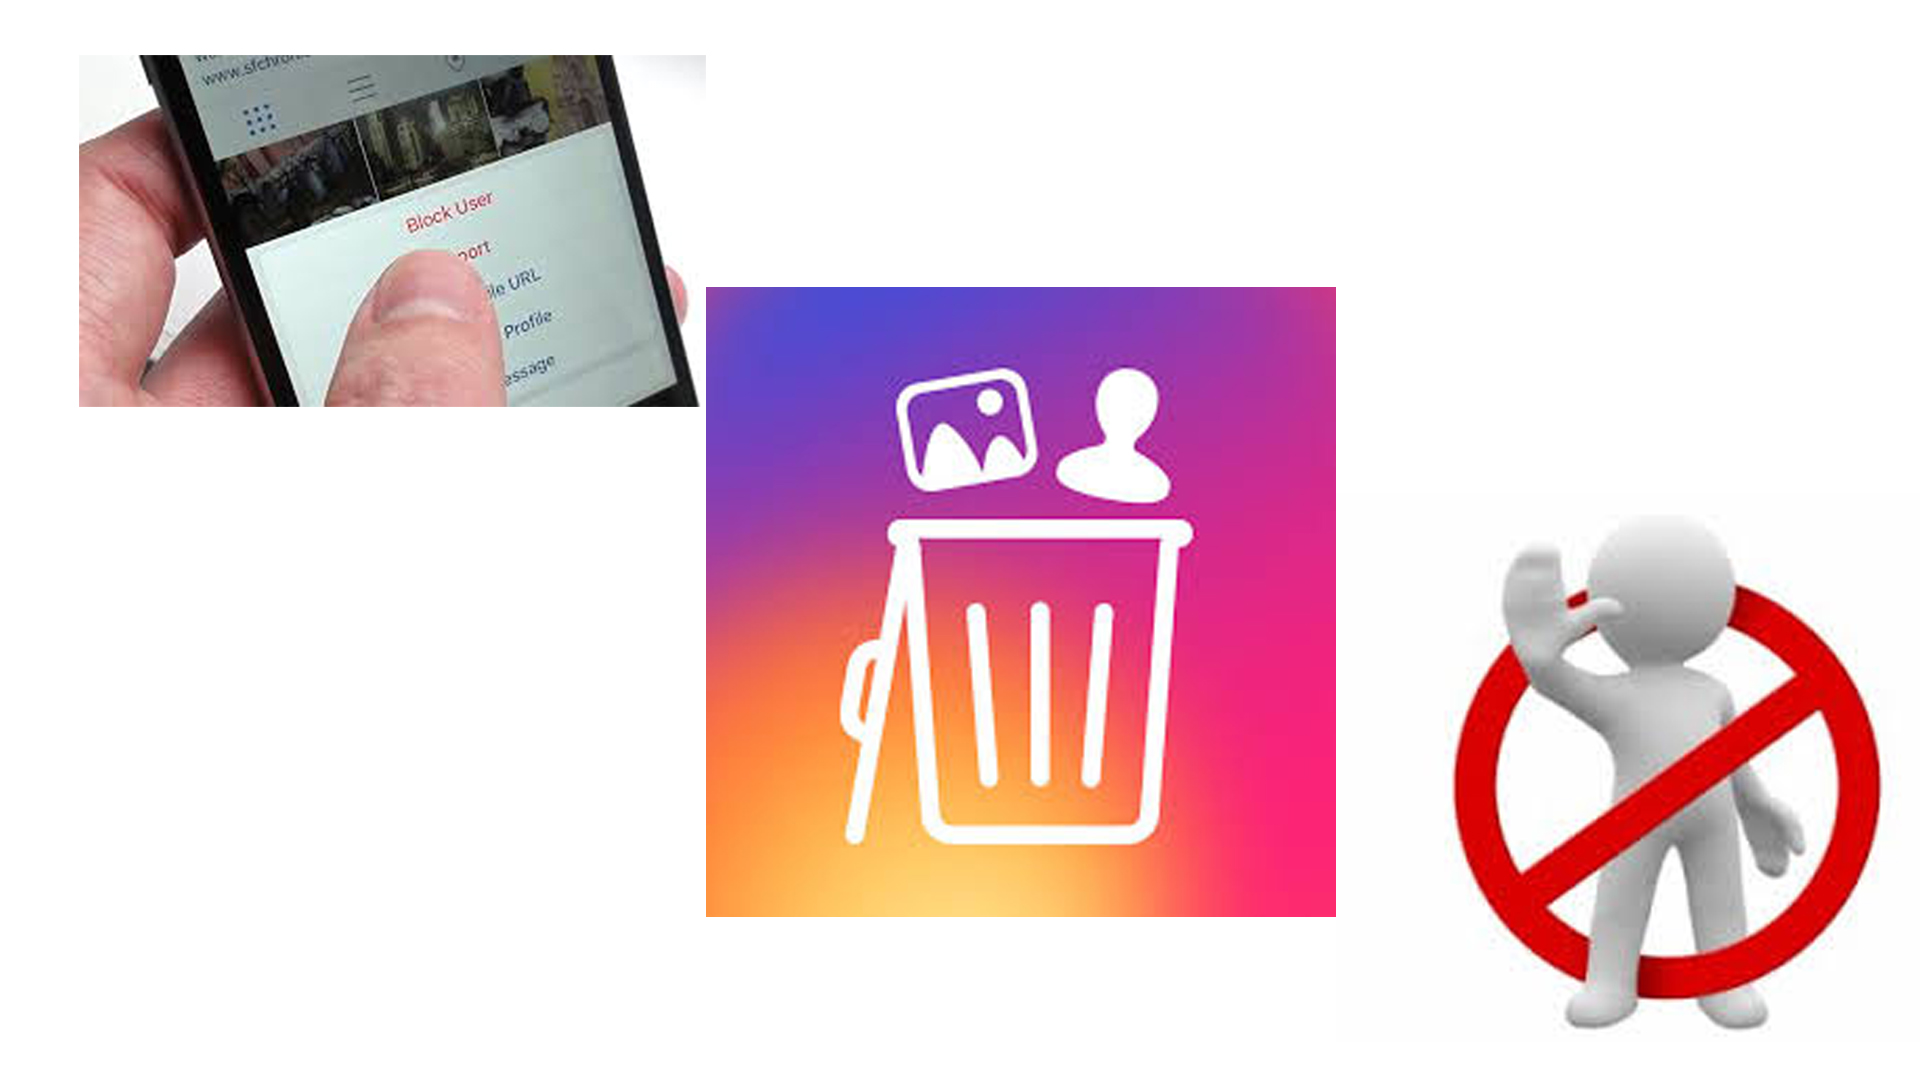 cara blokir akun instagram - rio bermano